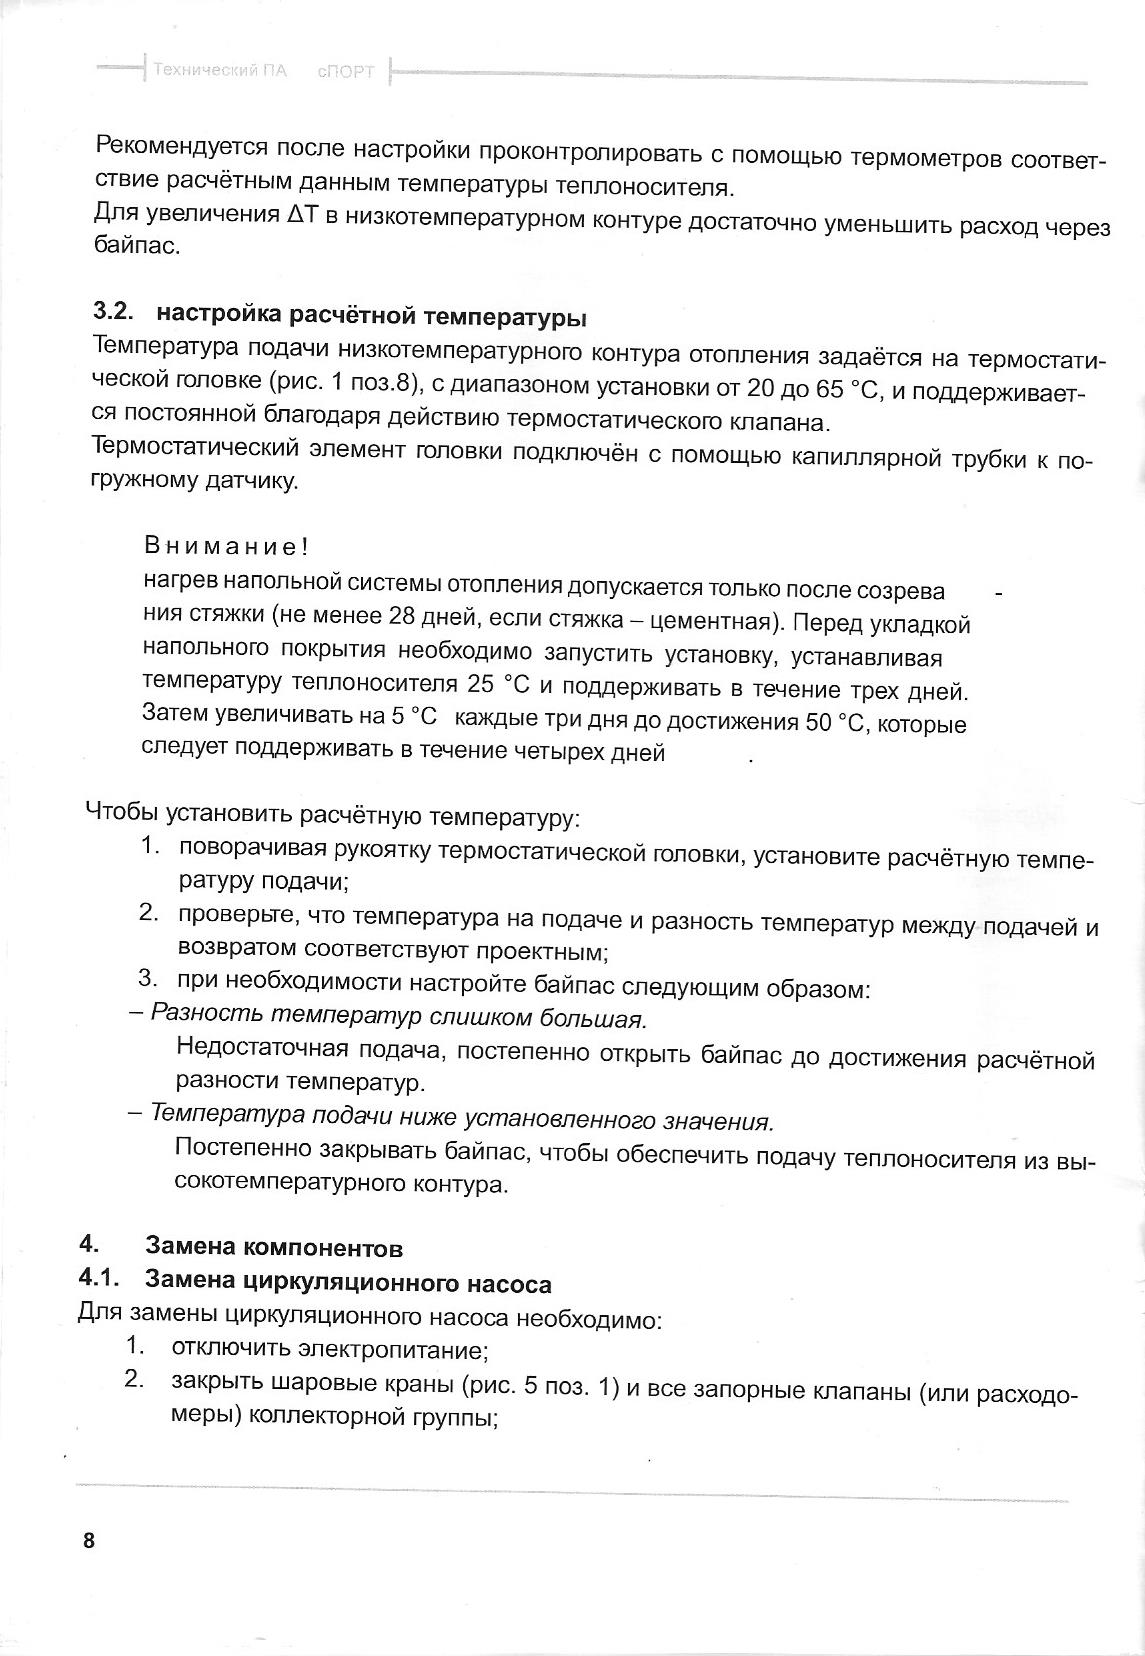 стр 7